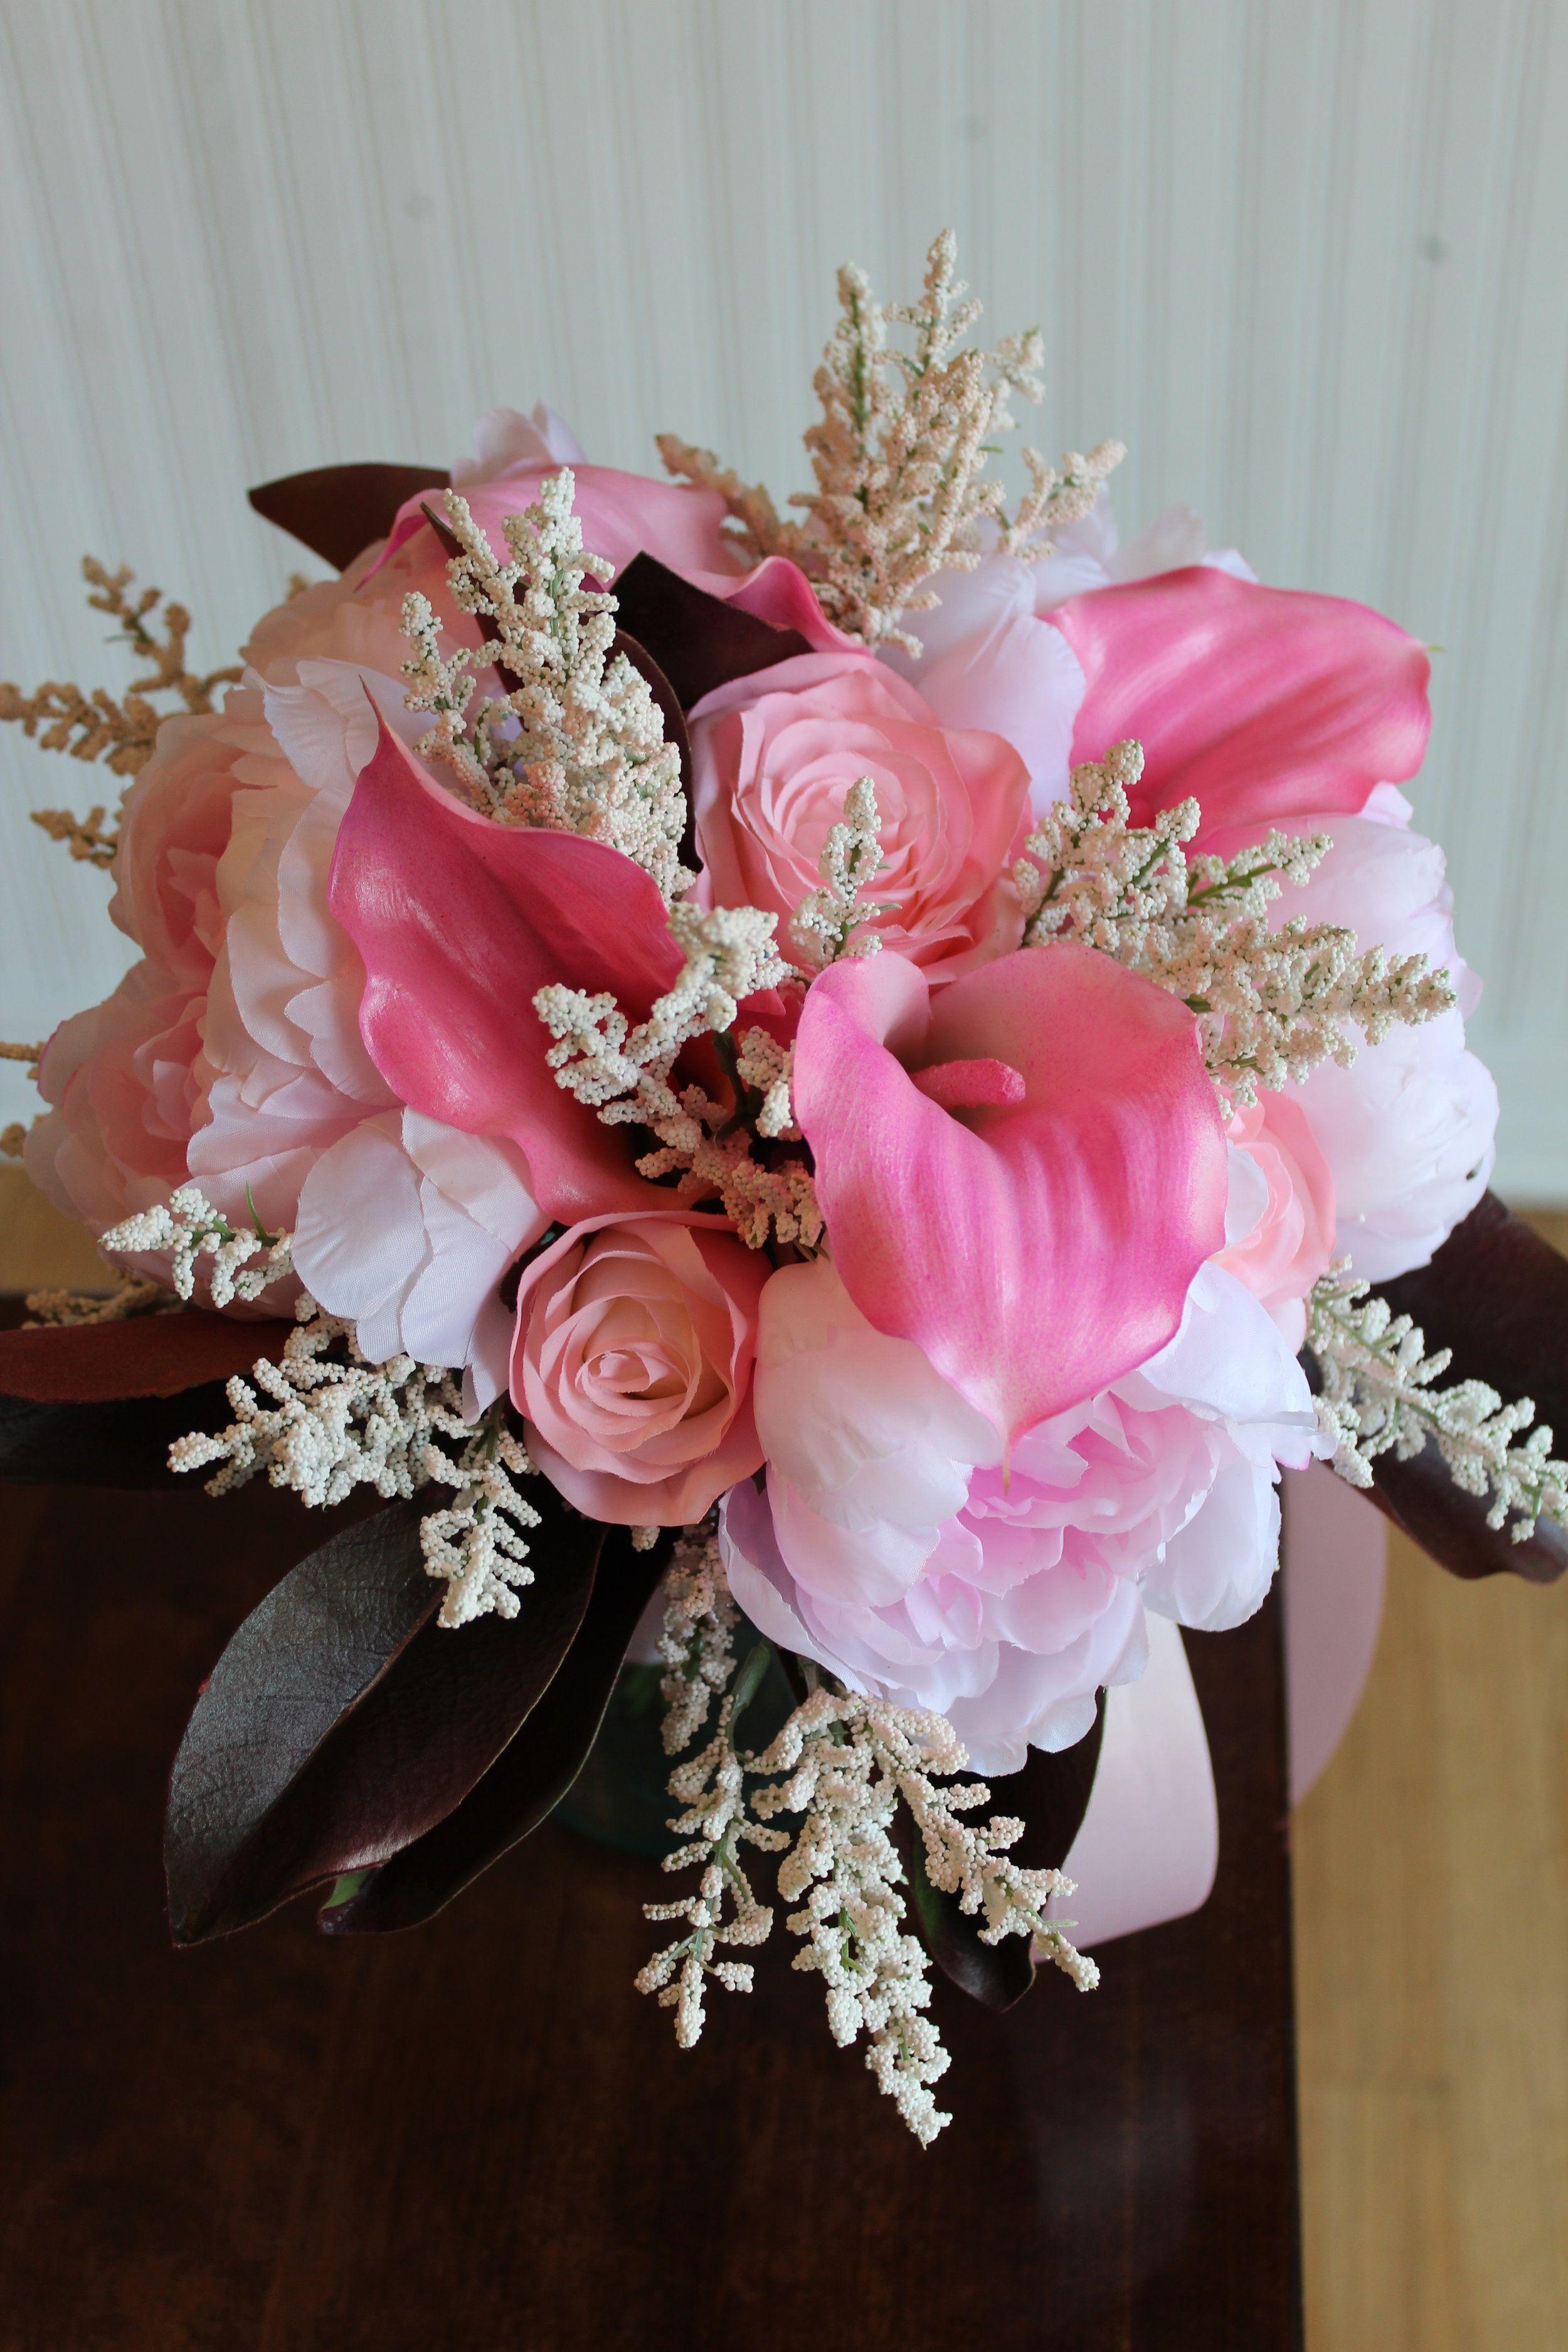 Blush Pink Bridal Bouquet Recreation in Silk Flowers